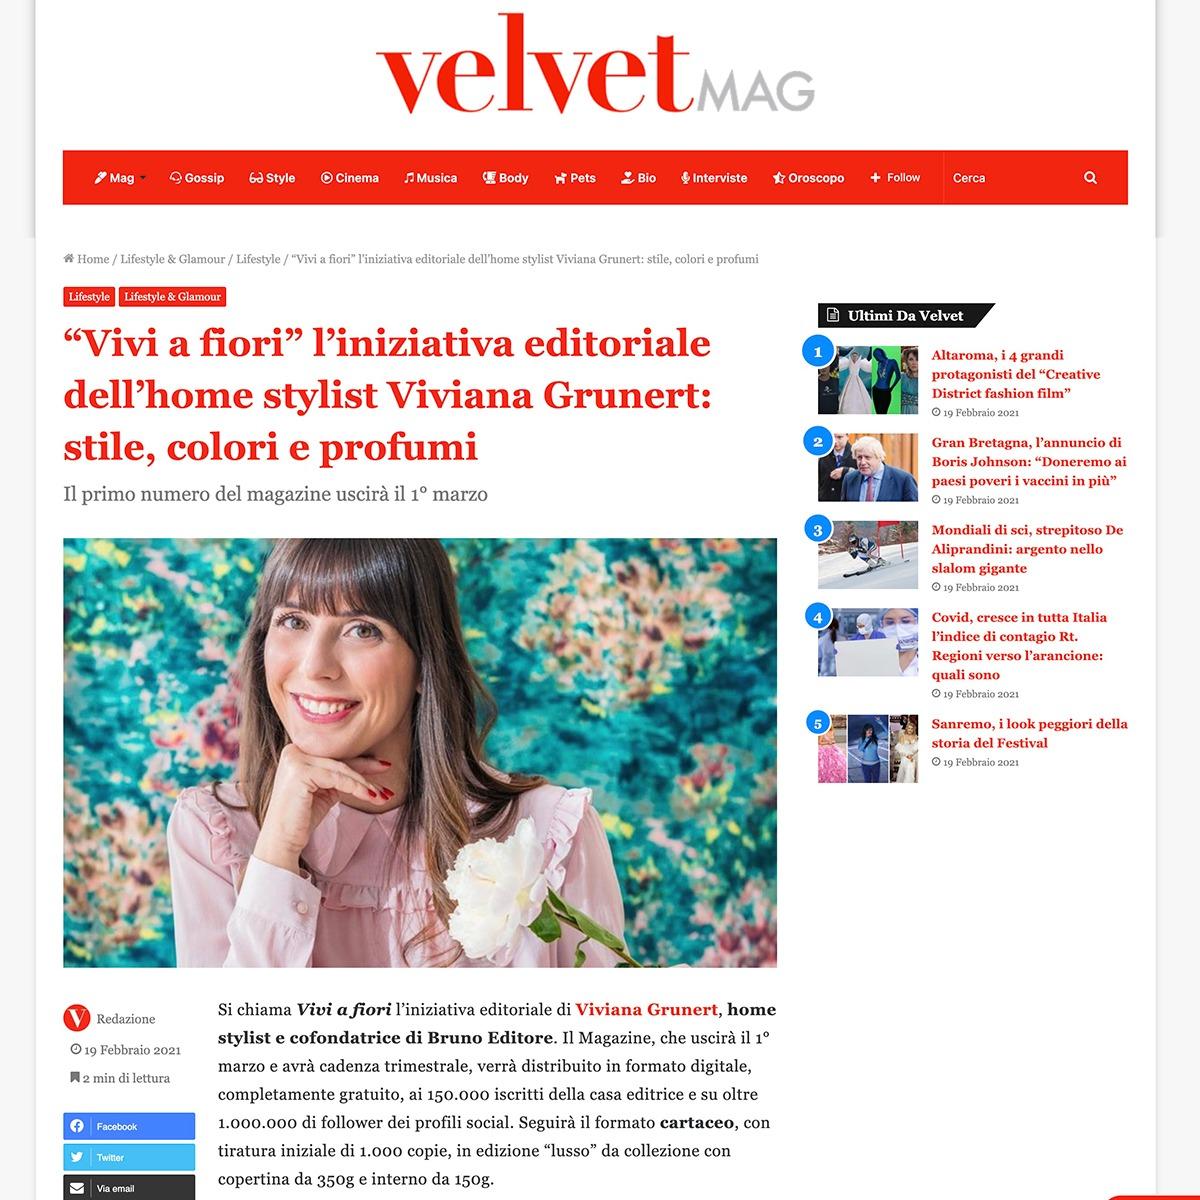 Viviana Grunert su VELVET MAG-19.02.2021